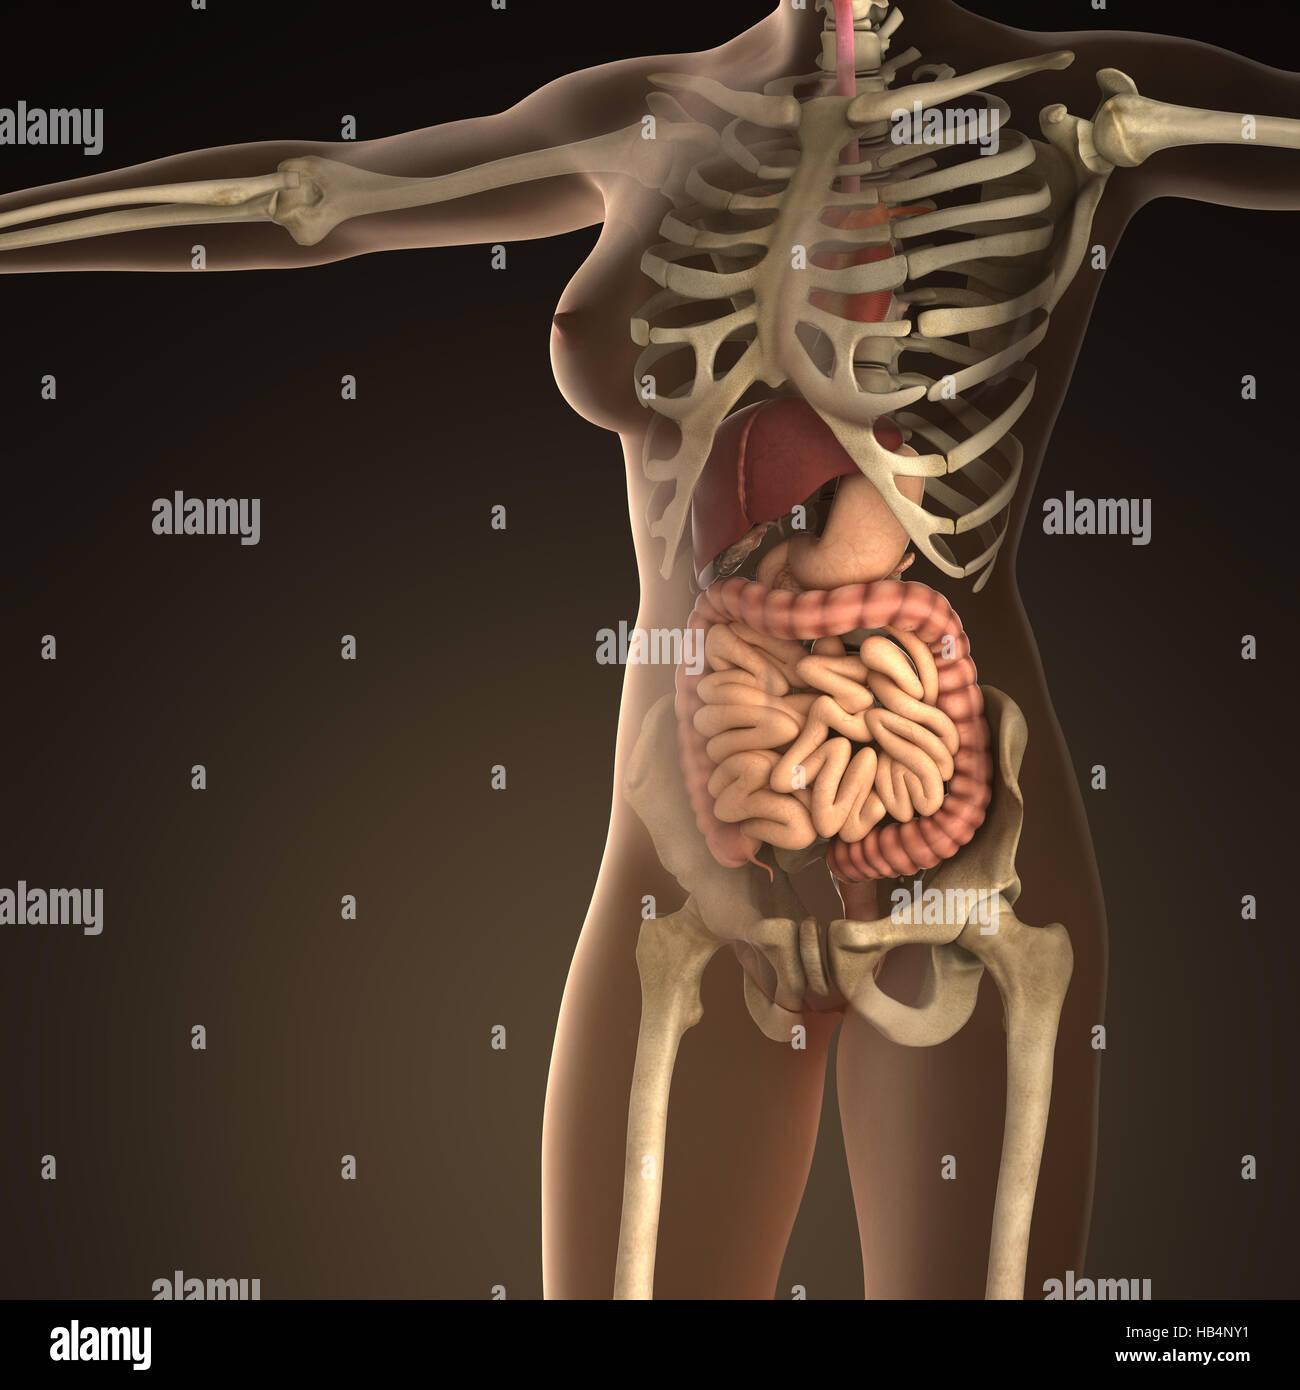 Abdominal Organs Stockfotos & Abdominal Organs Bilder - Alamy